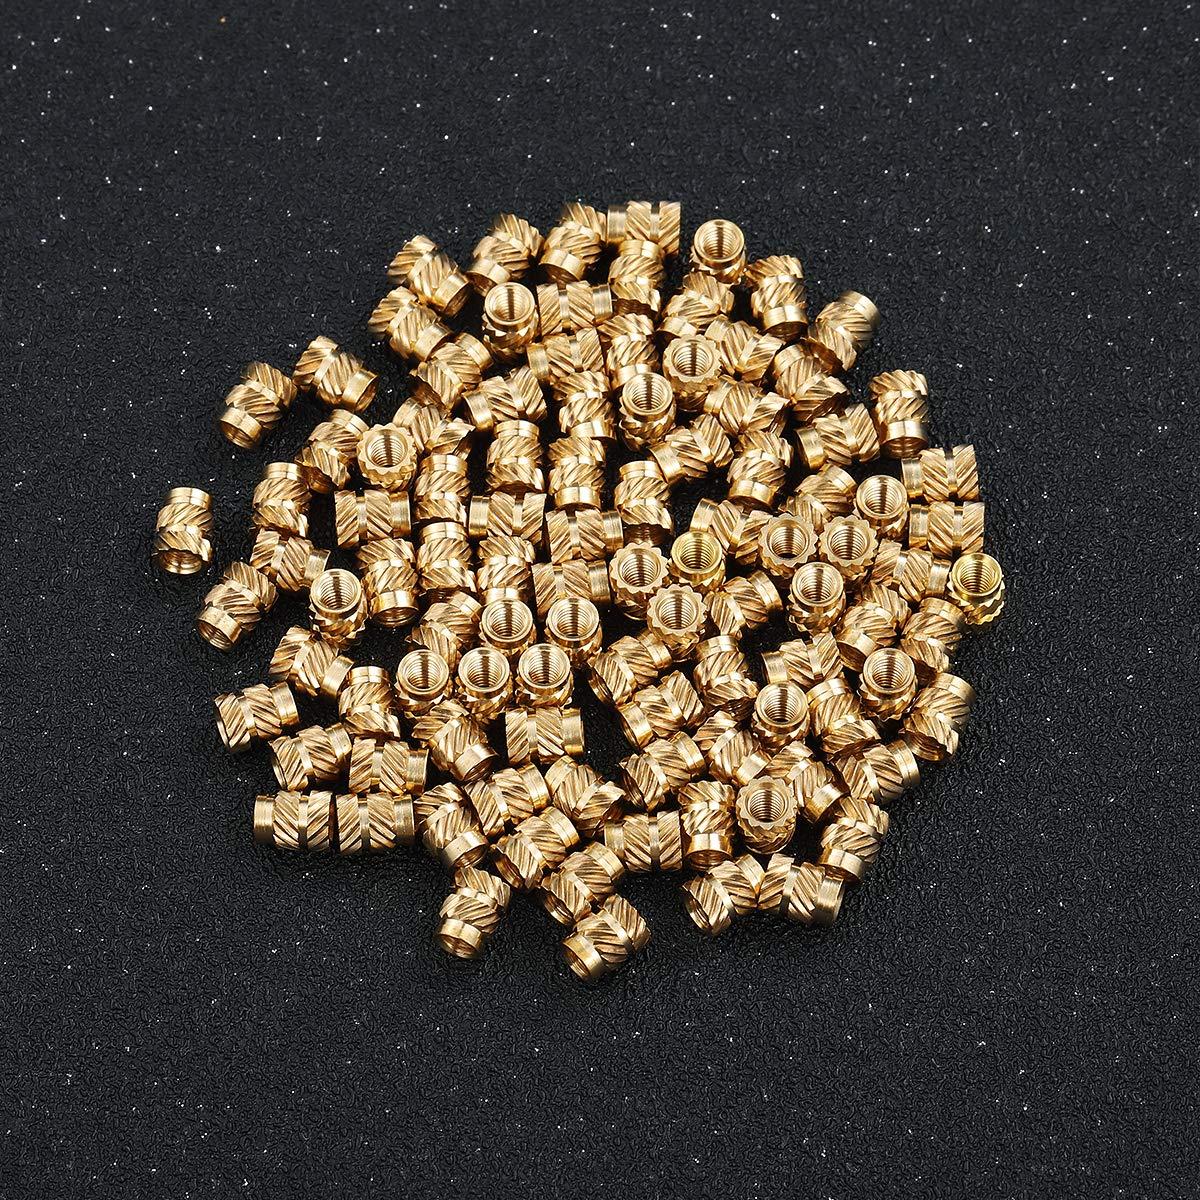 AliExpress - 100pcs Brass Nuts Embedment Nut M3 Thread Brass Knurled Nuts Threaded Heat Set for Printing 3D Printer